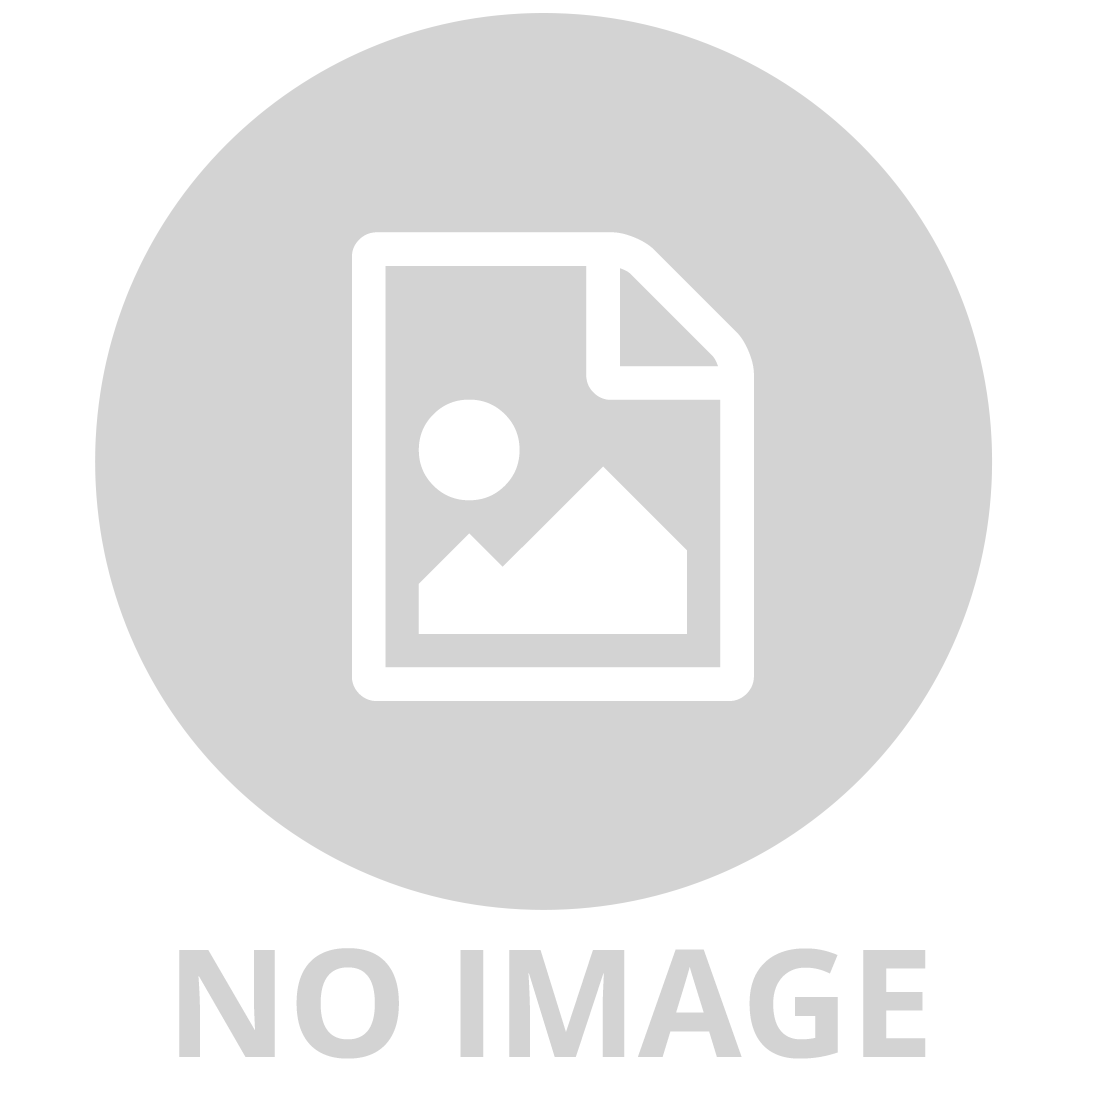 RAVENSBURGER- VENICE'S RIALTO BRIDGE 3D PUZZLE 216PC